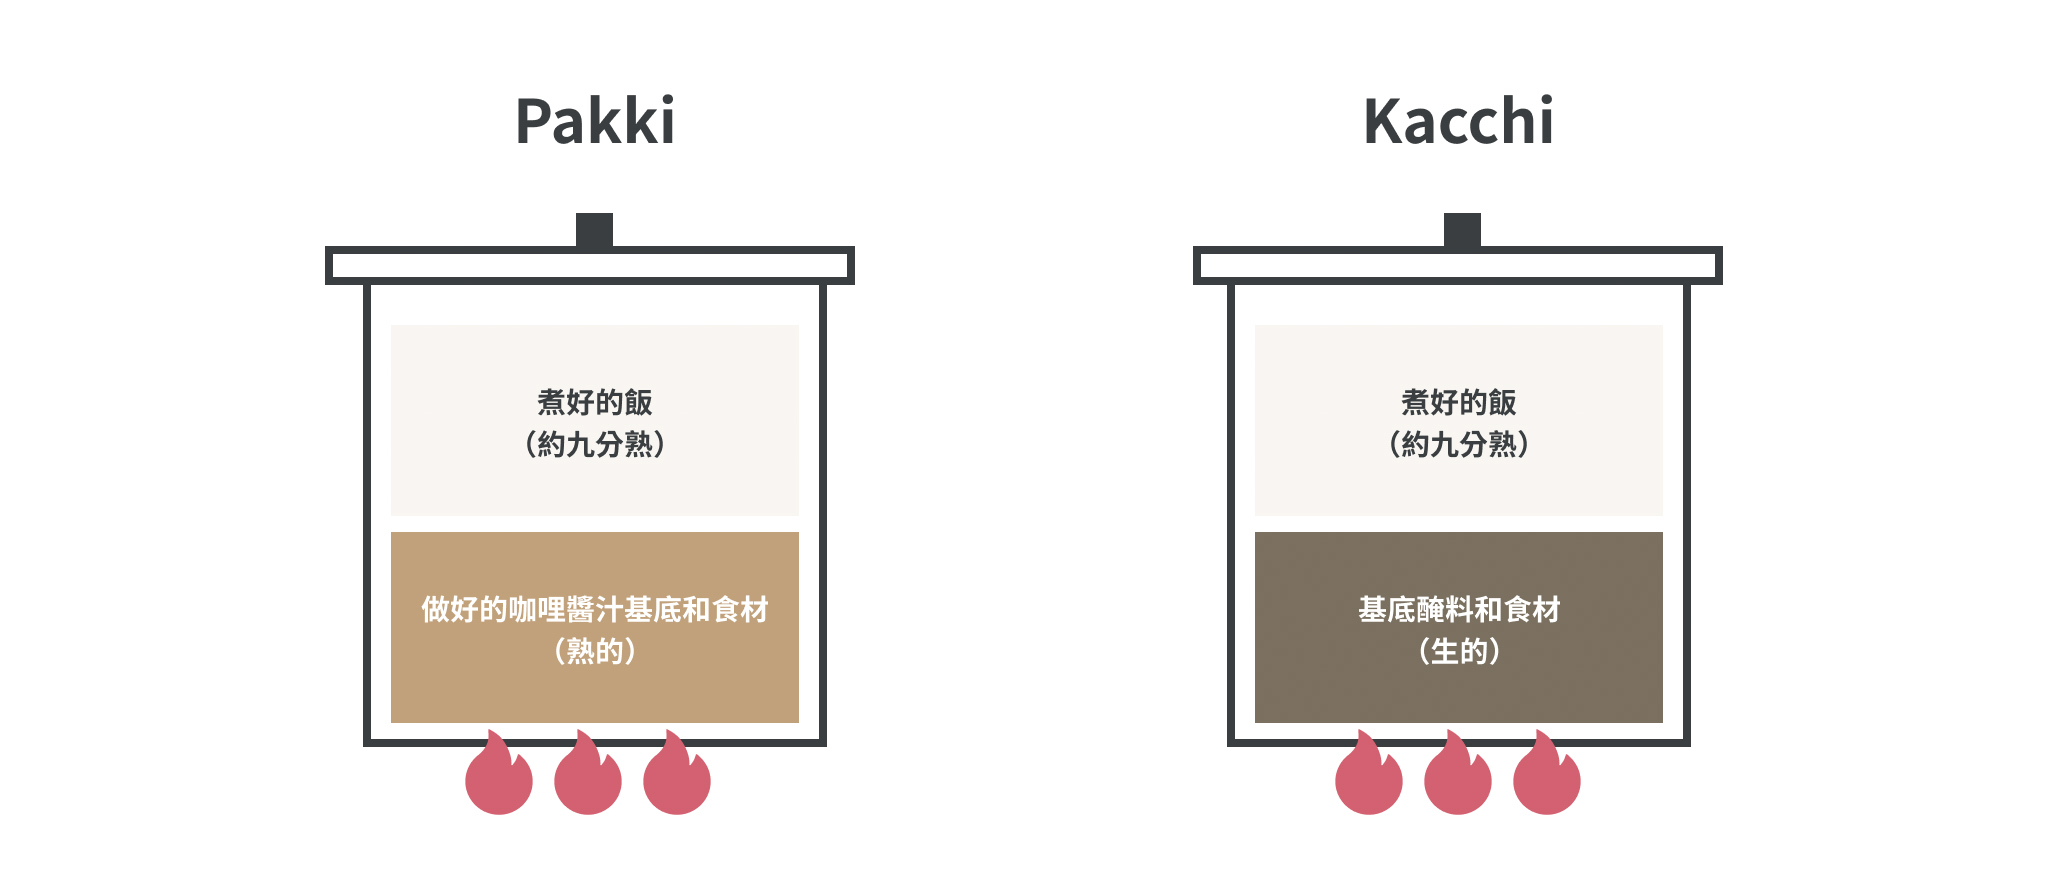 pakki kacchi的差異